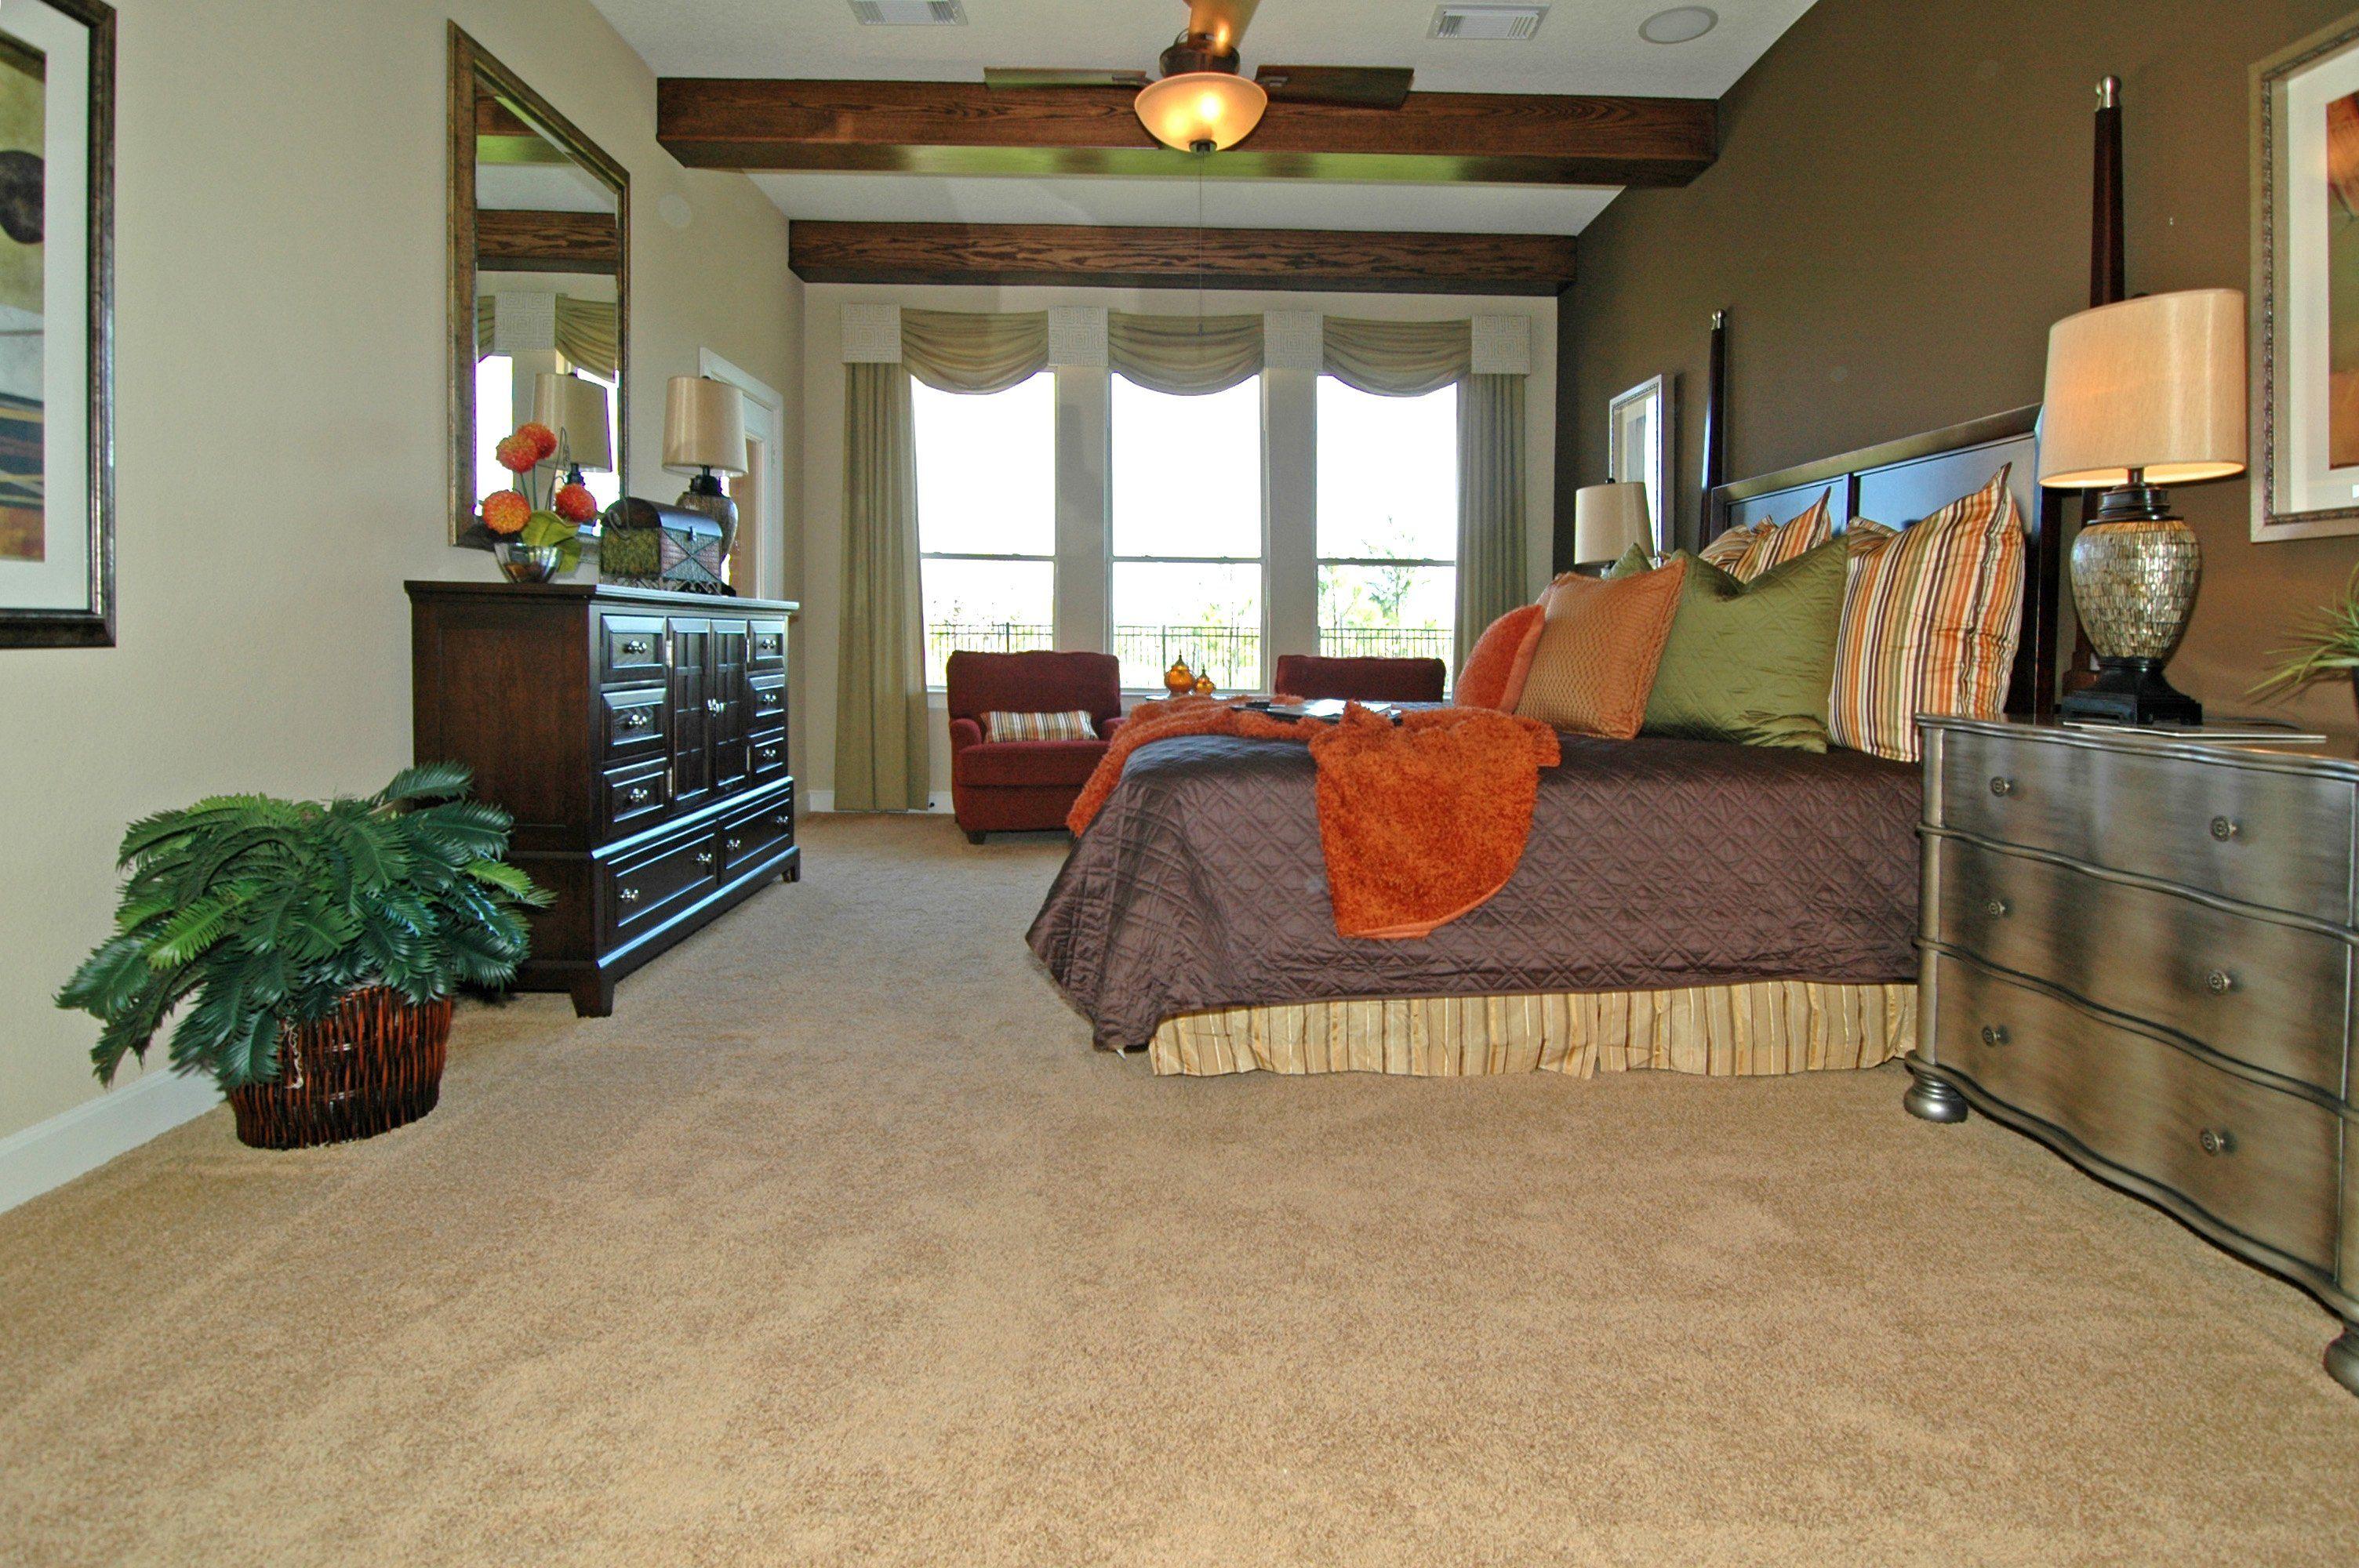 ModelHomeGallery - David Weekley Homes   Bedroom design ... on New Model Bedroom Design  id=38108